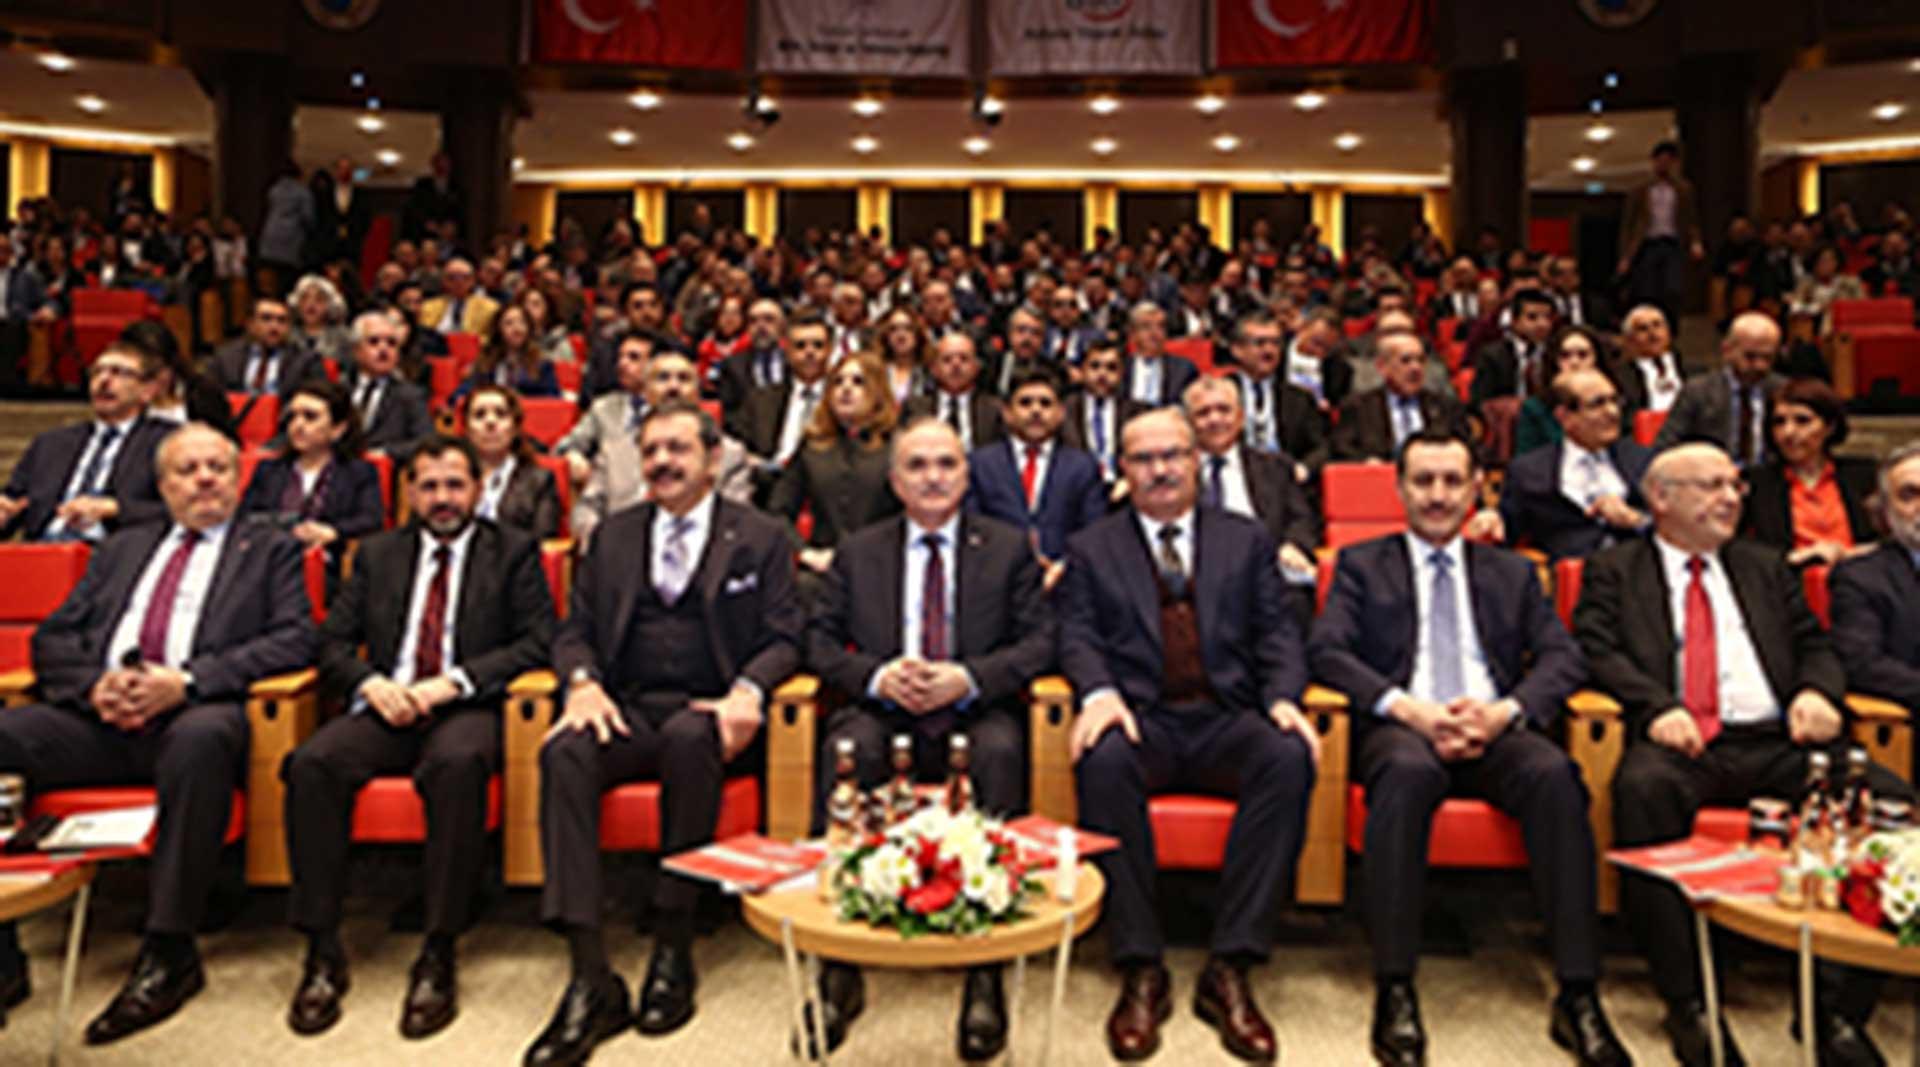 ATO'DAN YERLİ VE MİLLİ ÜRETİM KONFERANSI